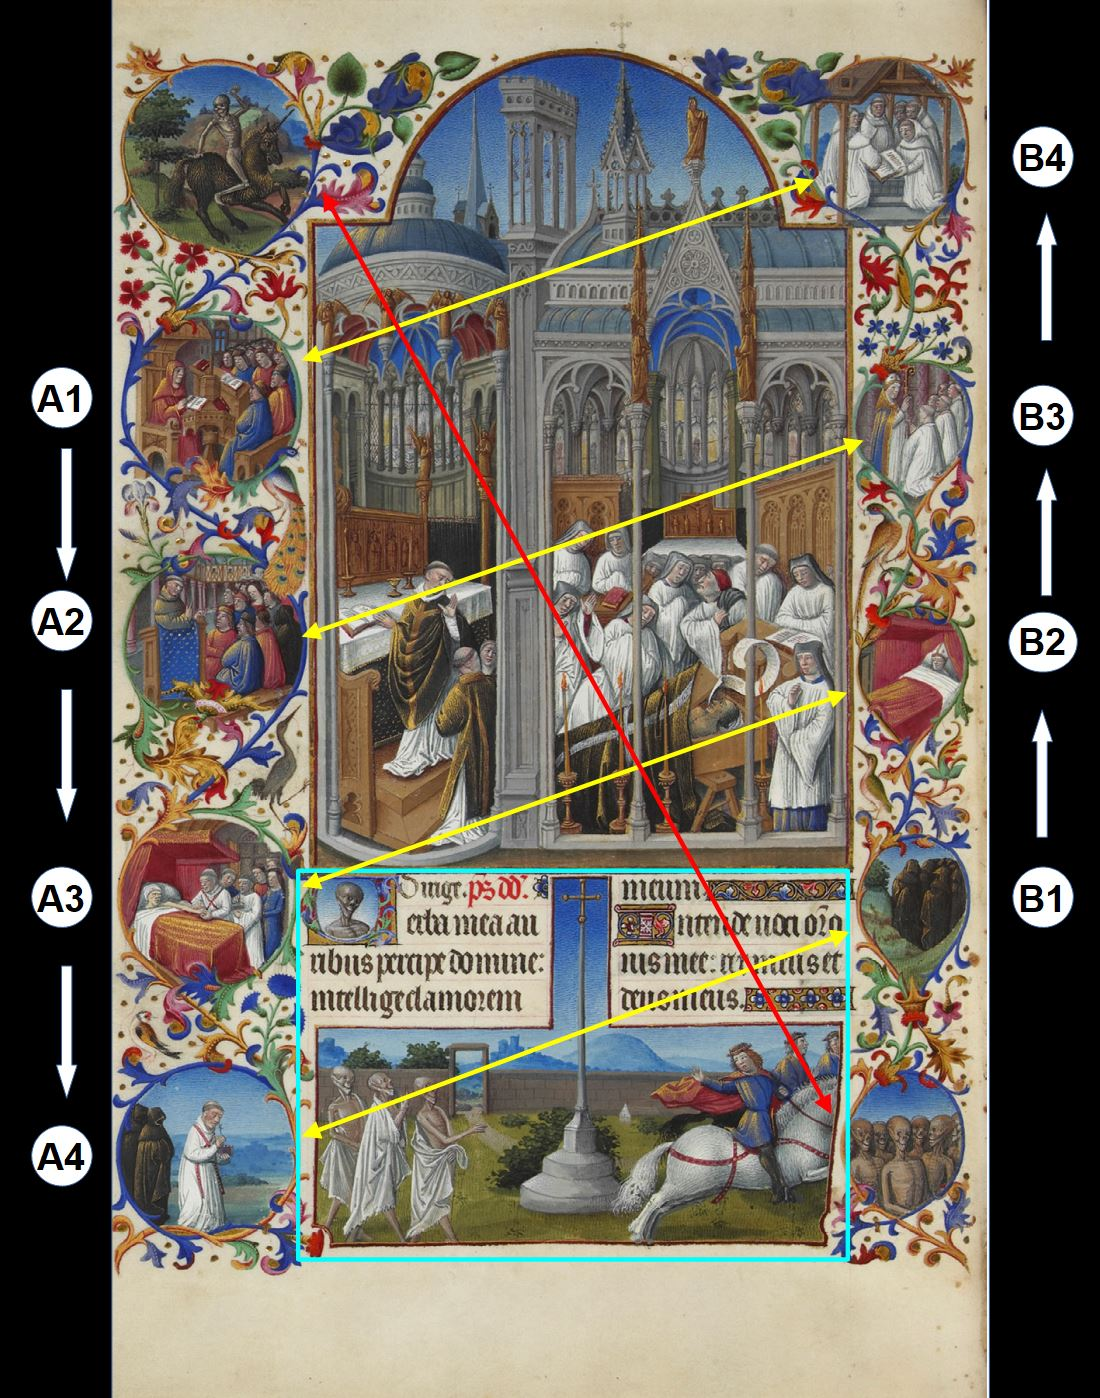 Les_Tres_Riches_Heures_du_duc_de_Berry Musee Conde Chantilly MS 65 fol 86v Obseques de Raymond Diocres 1411-16 schema